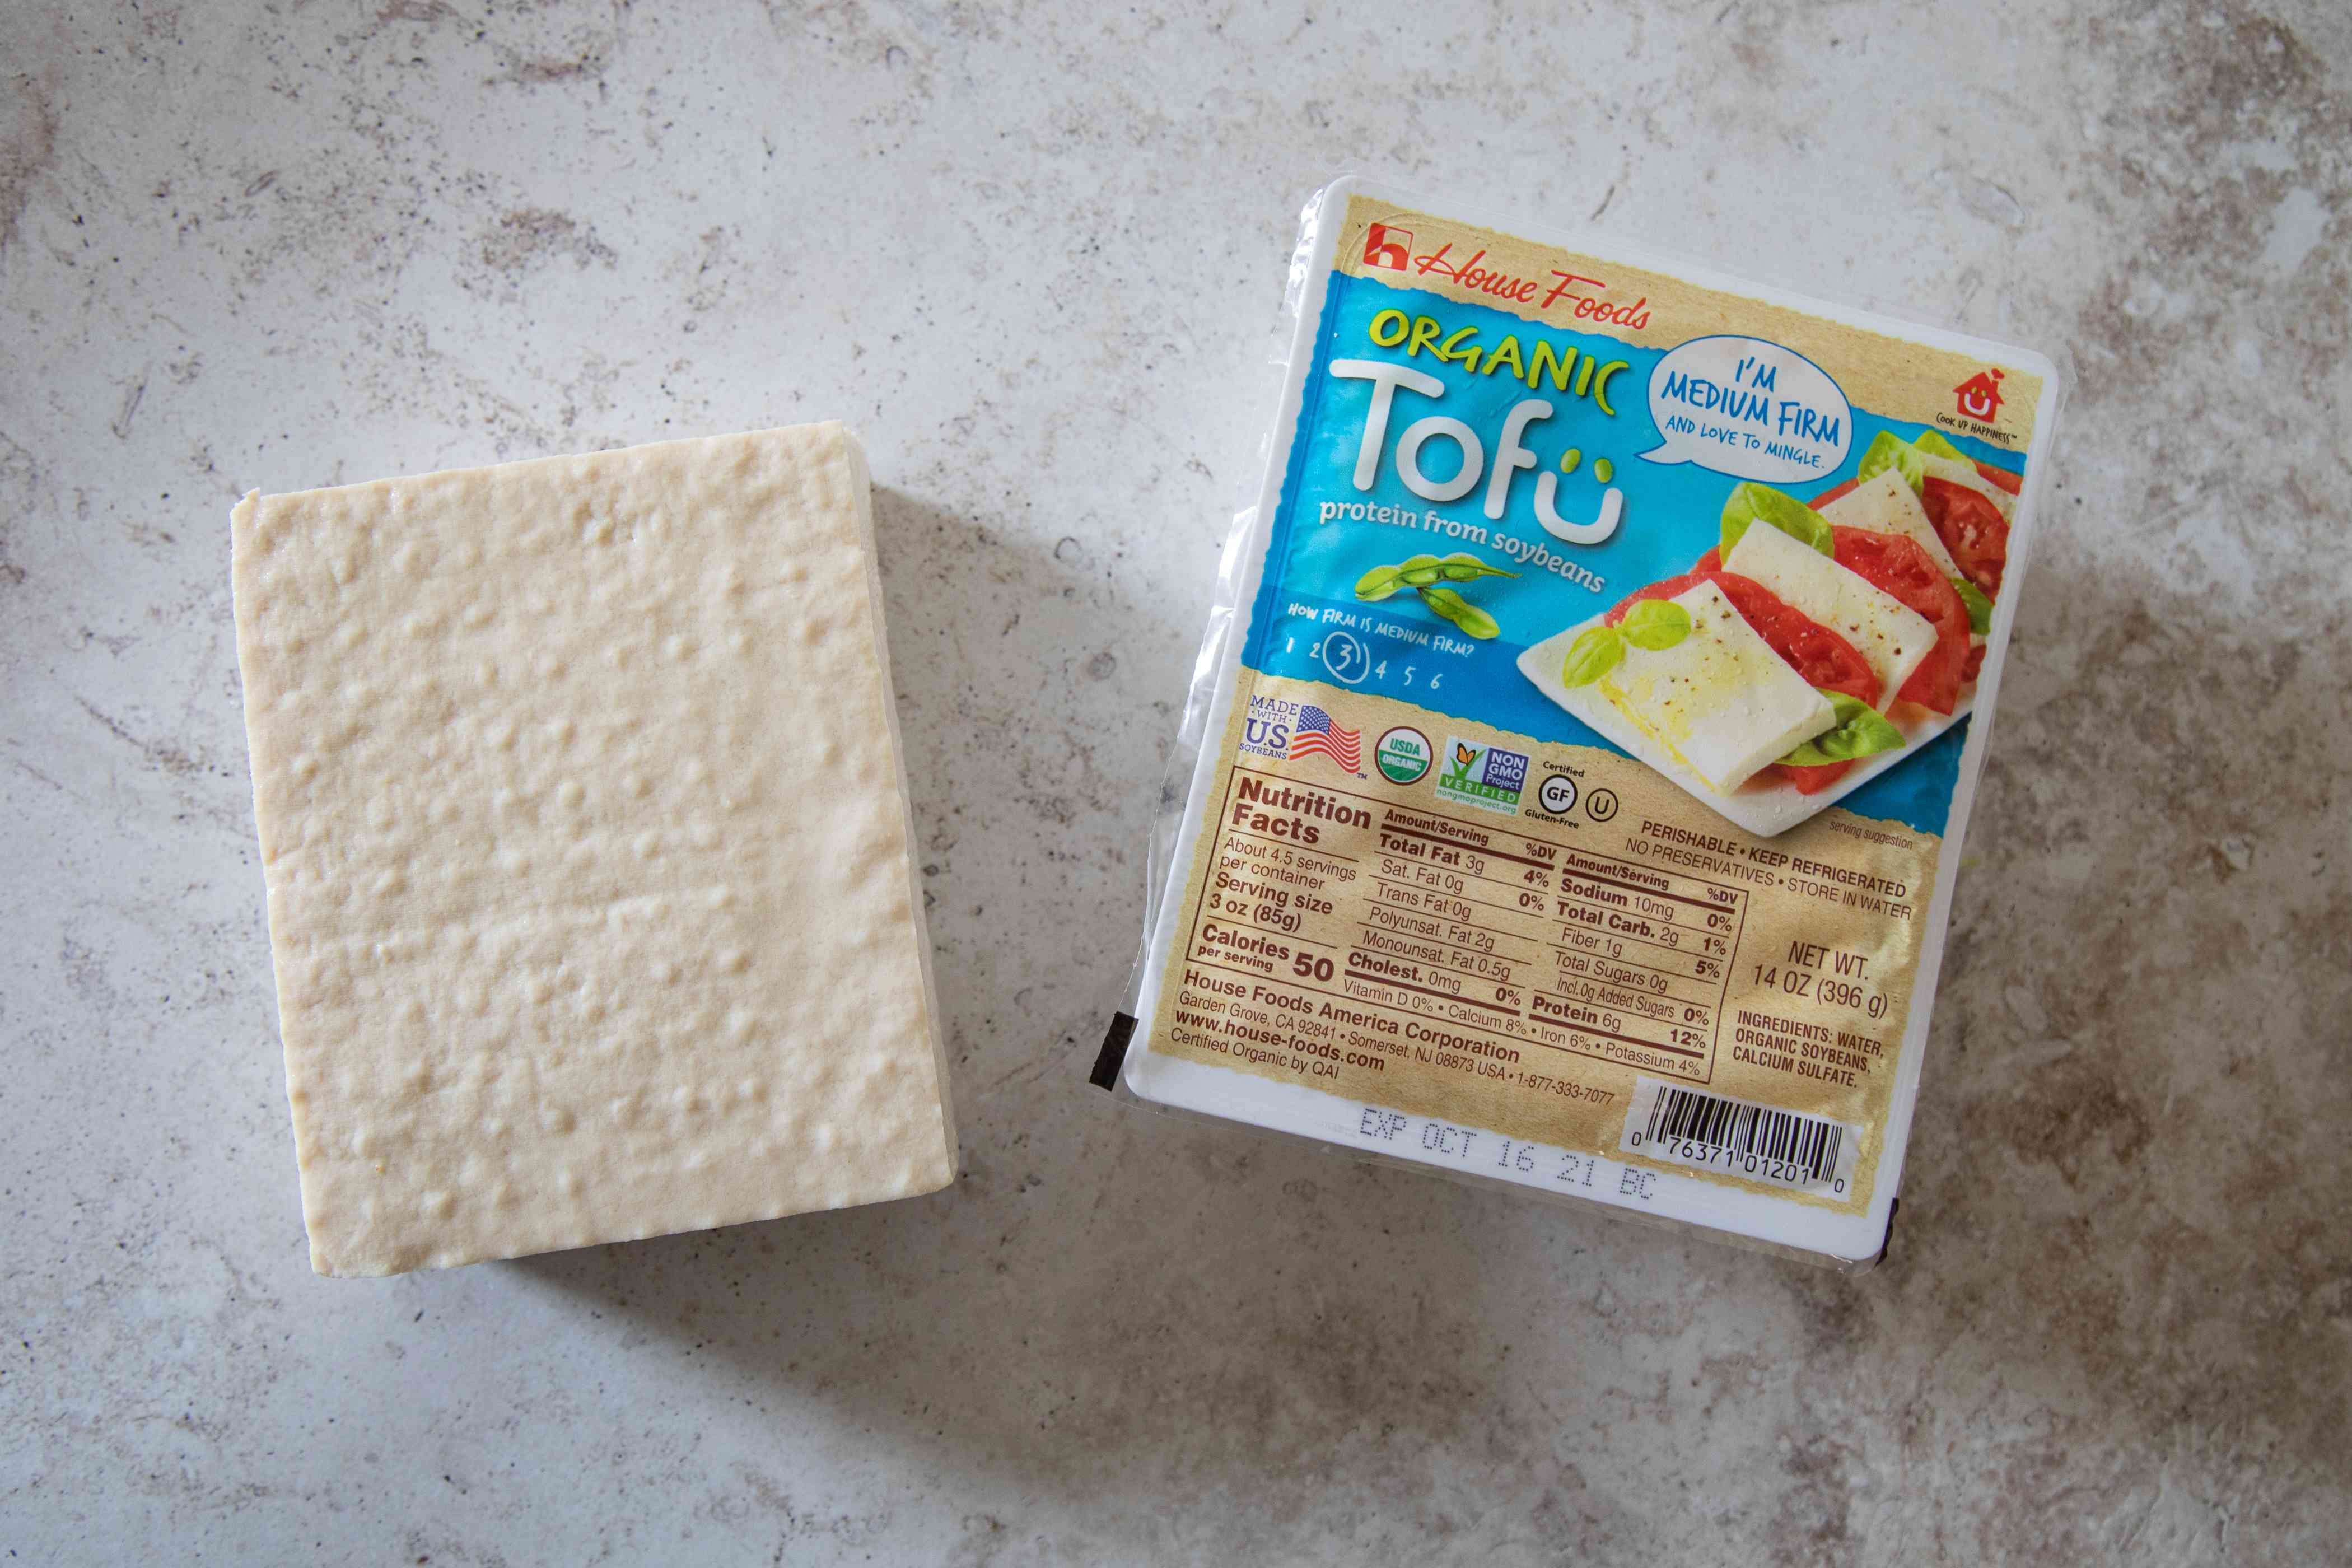 Package of medium firm tofu